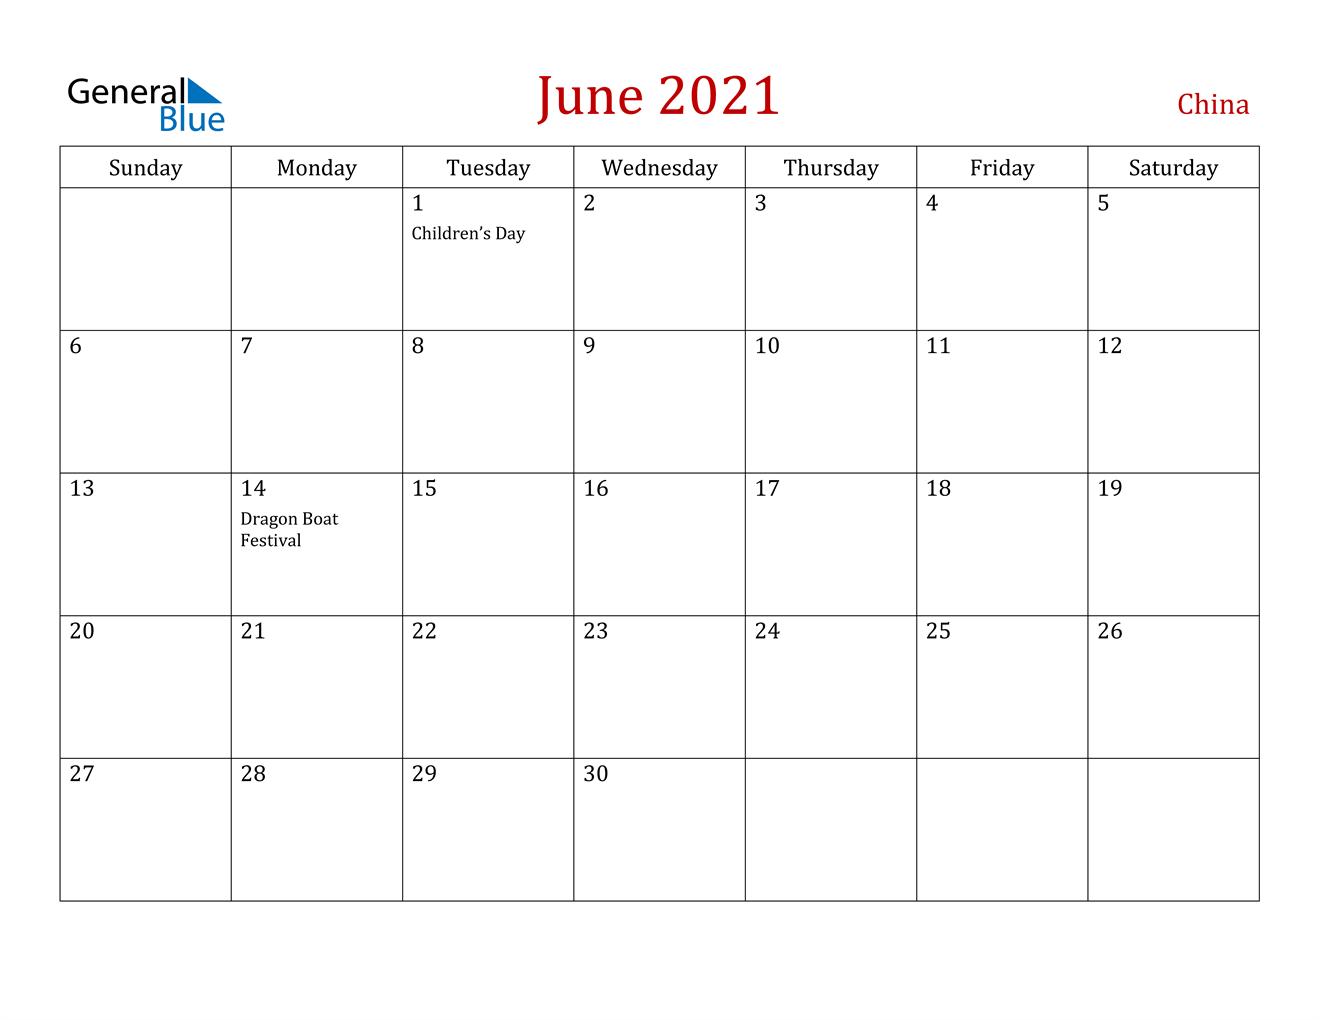 June 2021 Calendar - China